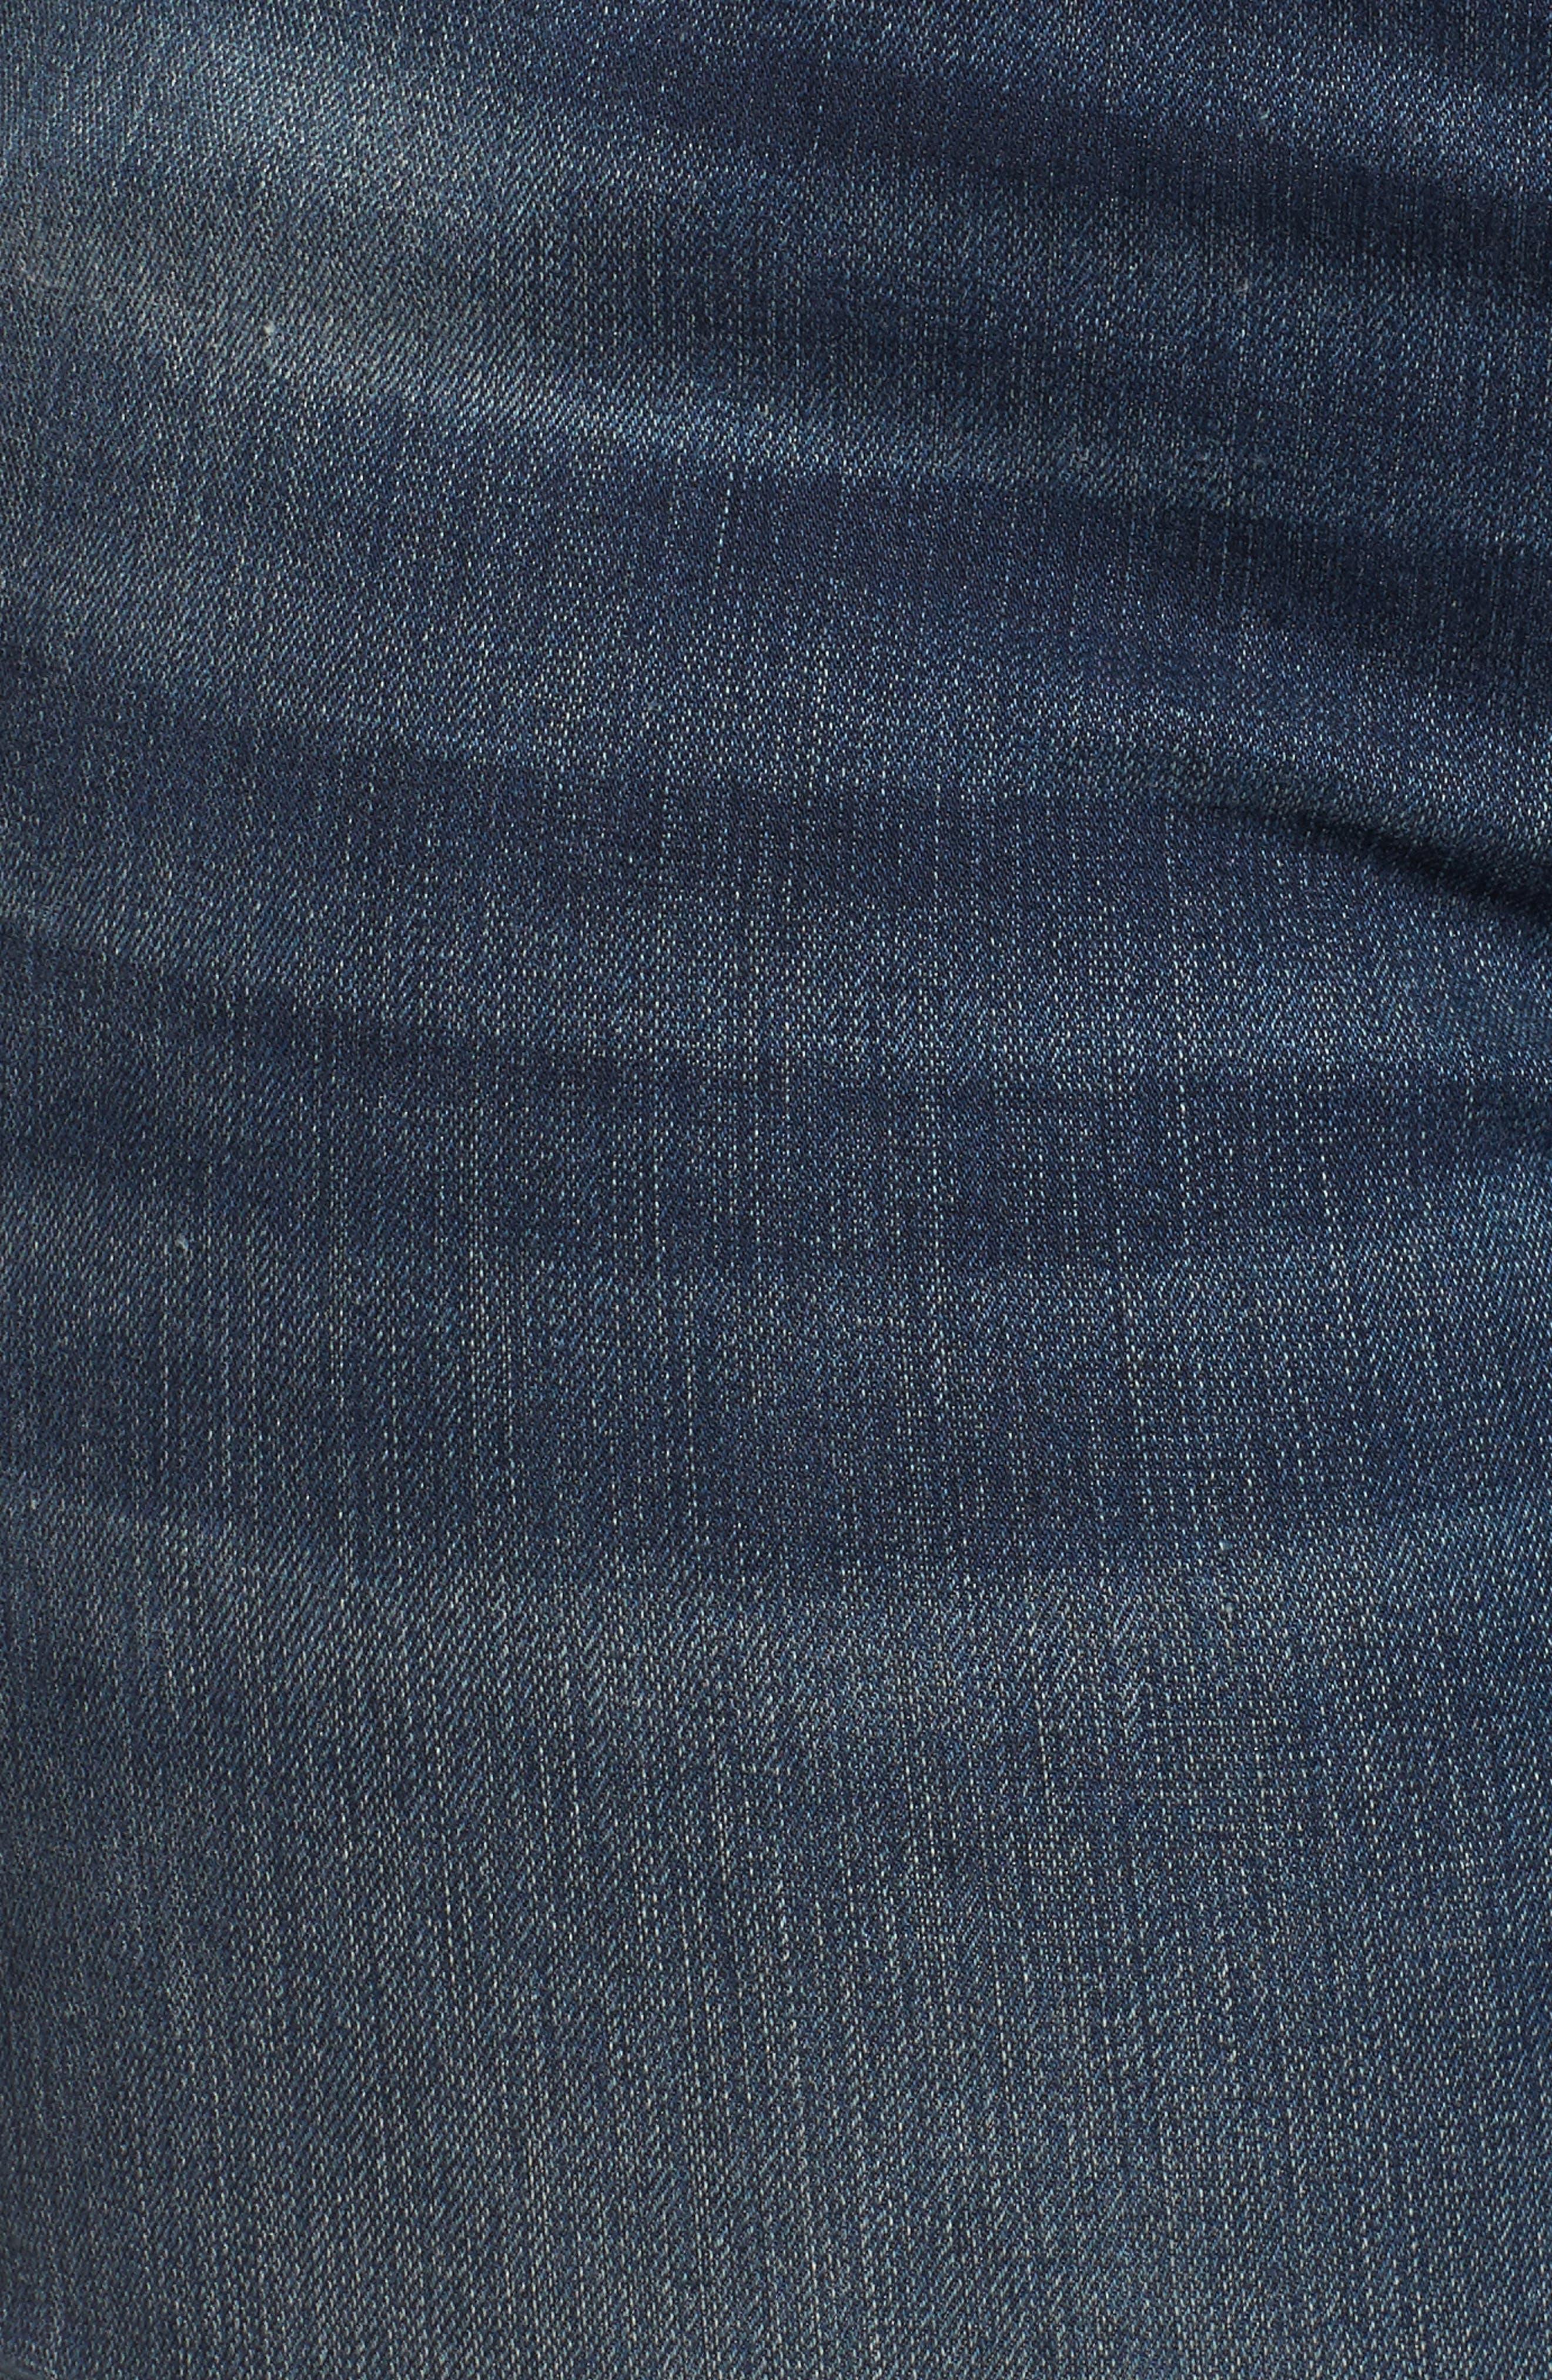 Step Hem Skinny Jeans,                             Alternate thumbnail 5, color,                             422